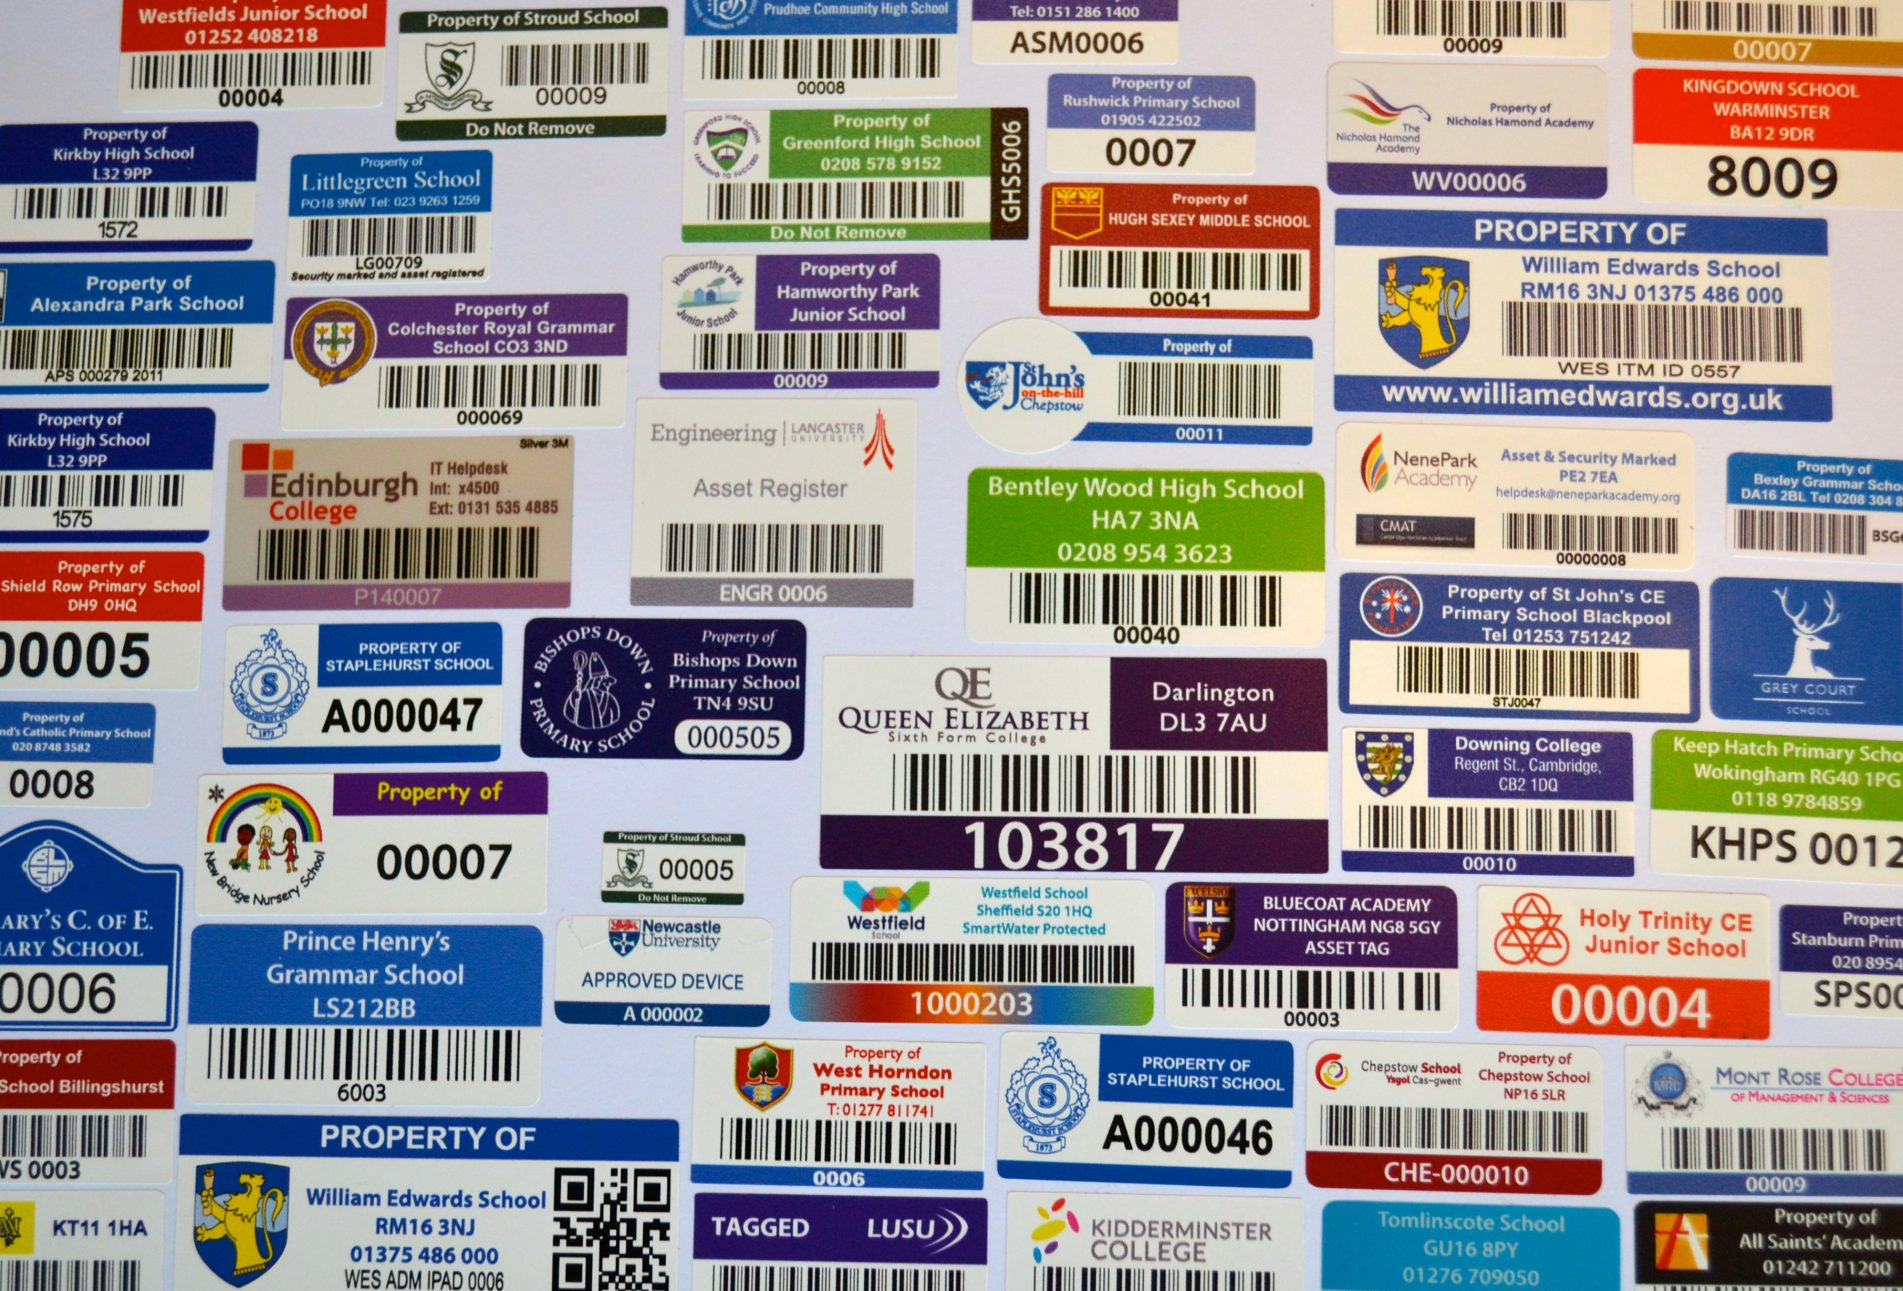 School asset label stickers